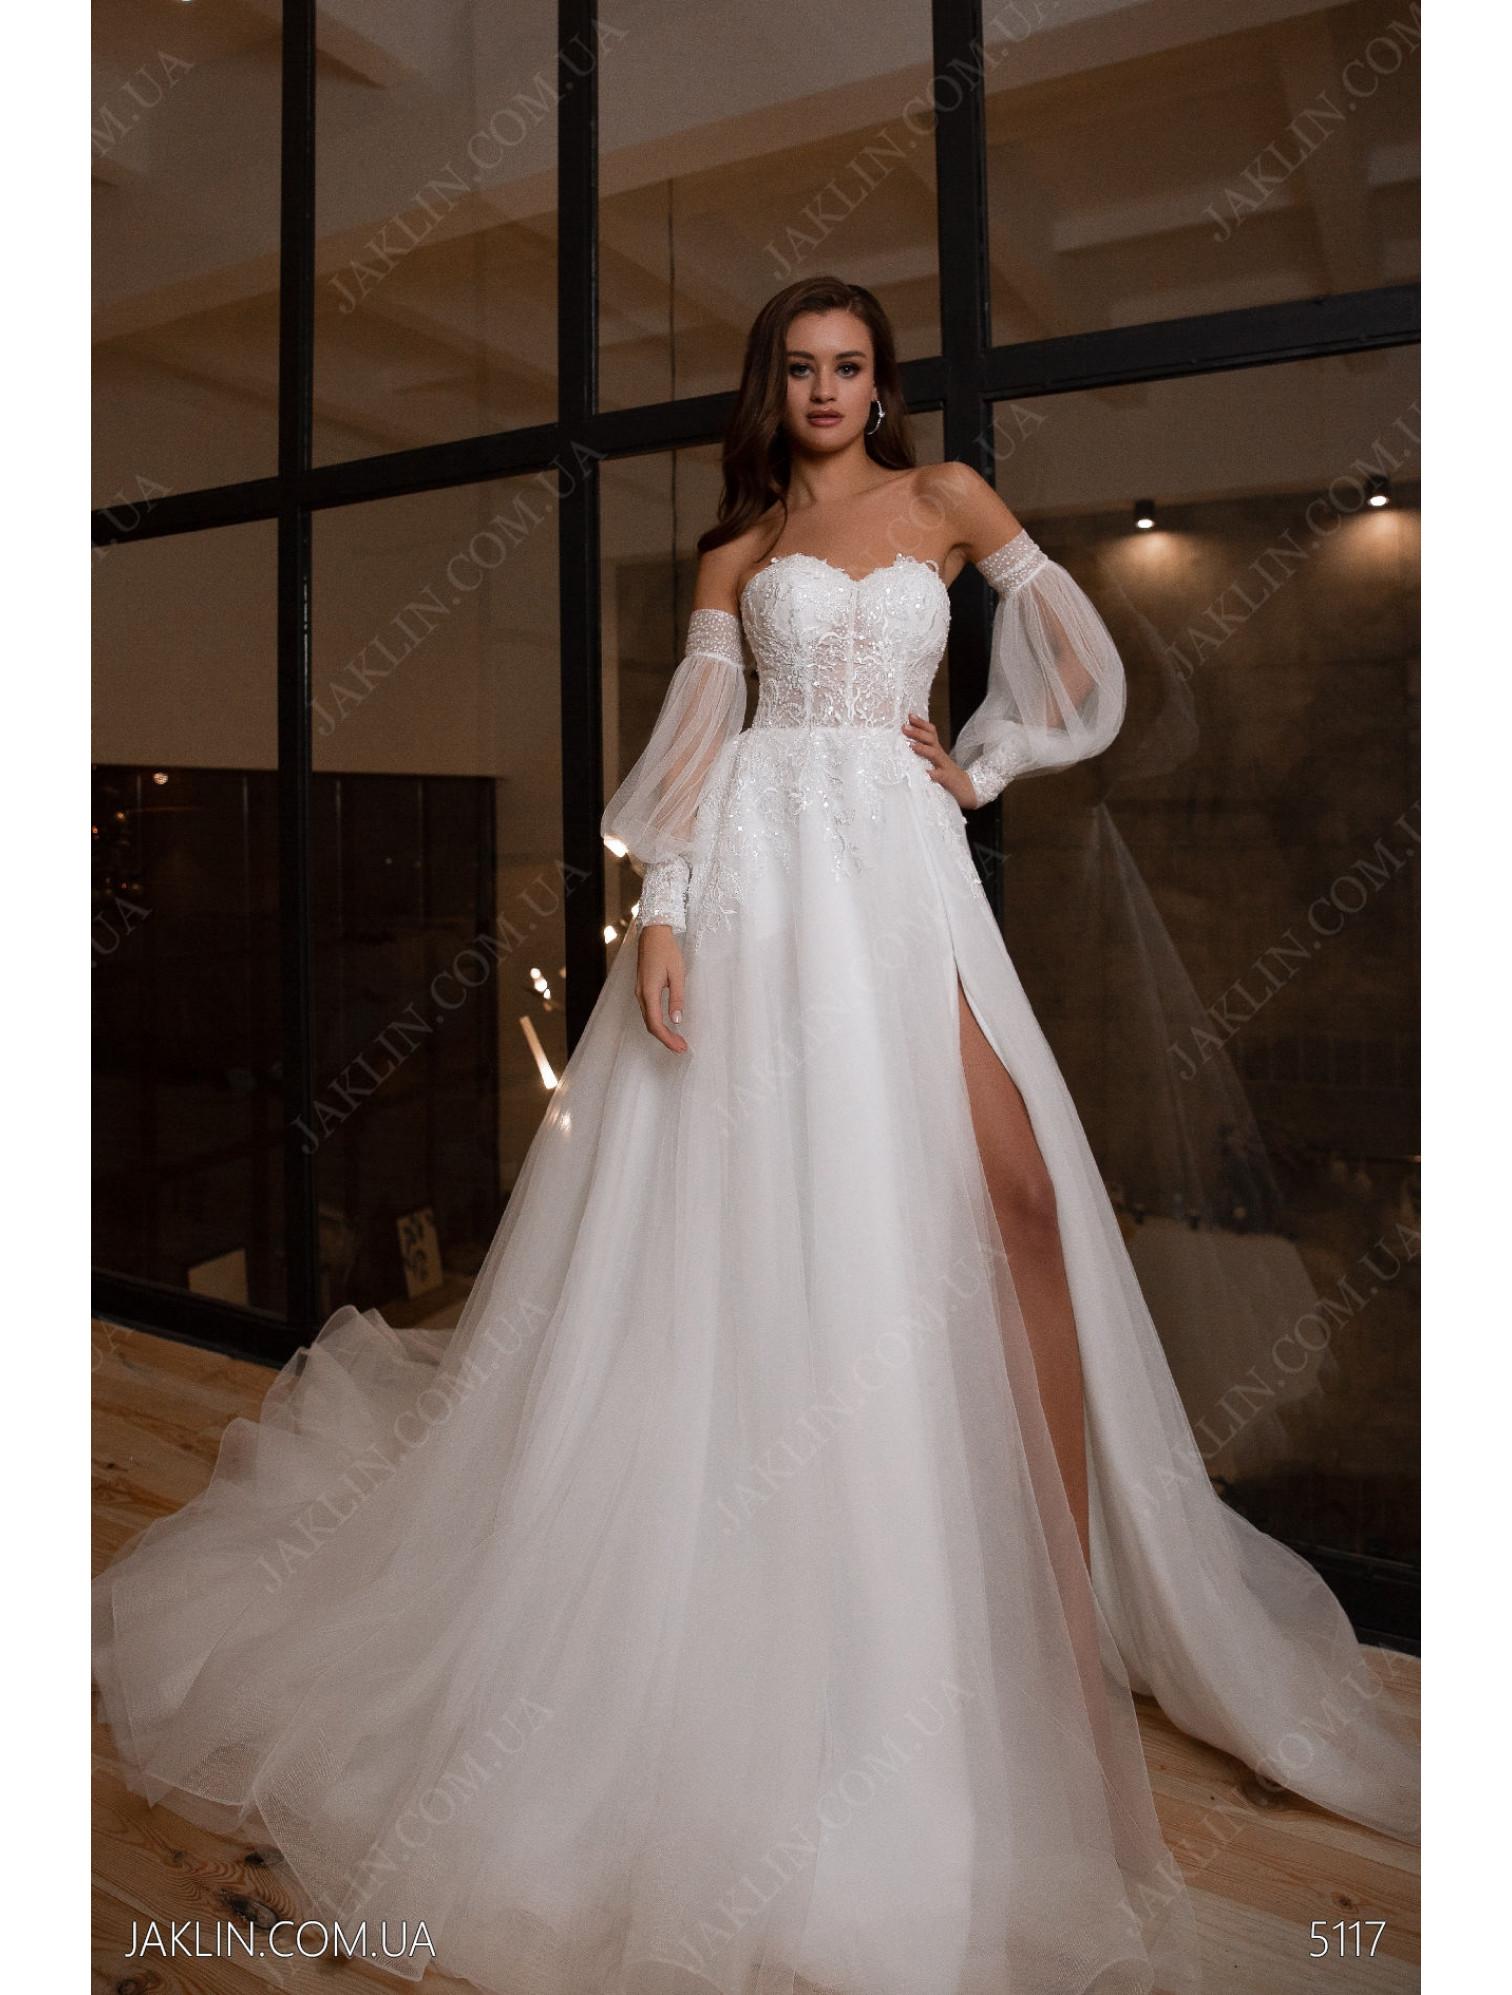 Wedding dress 5117